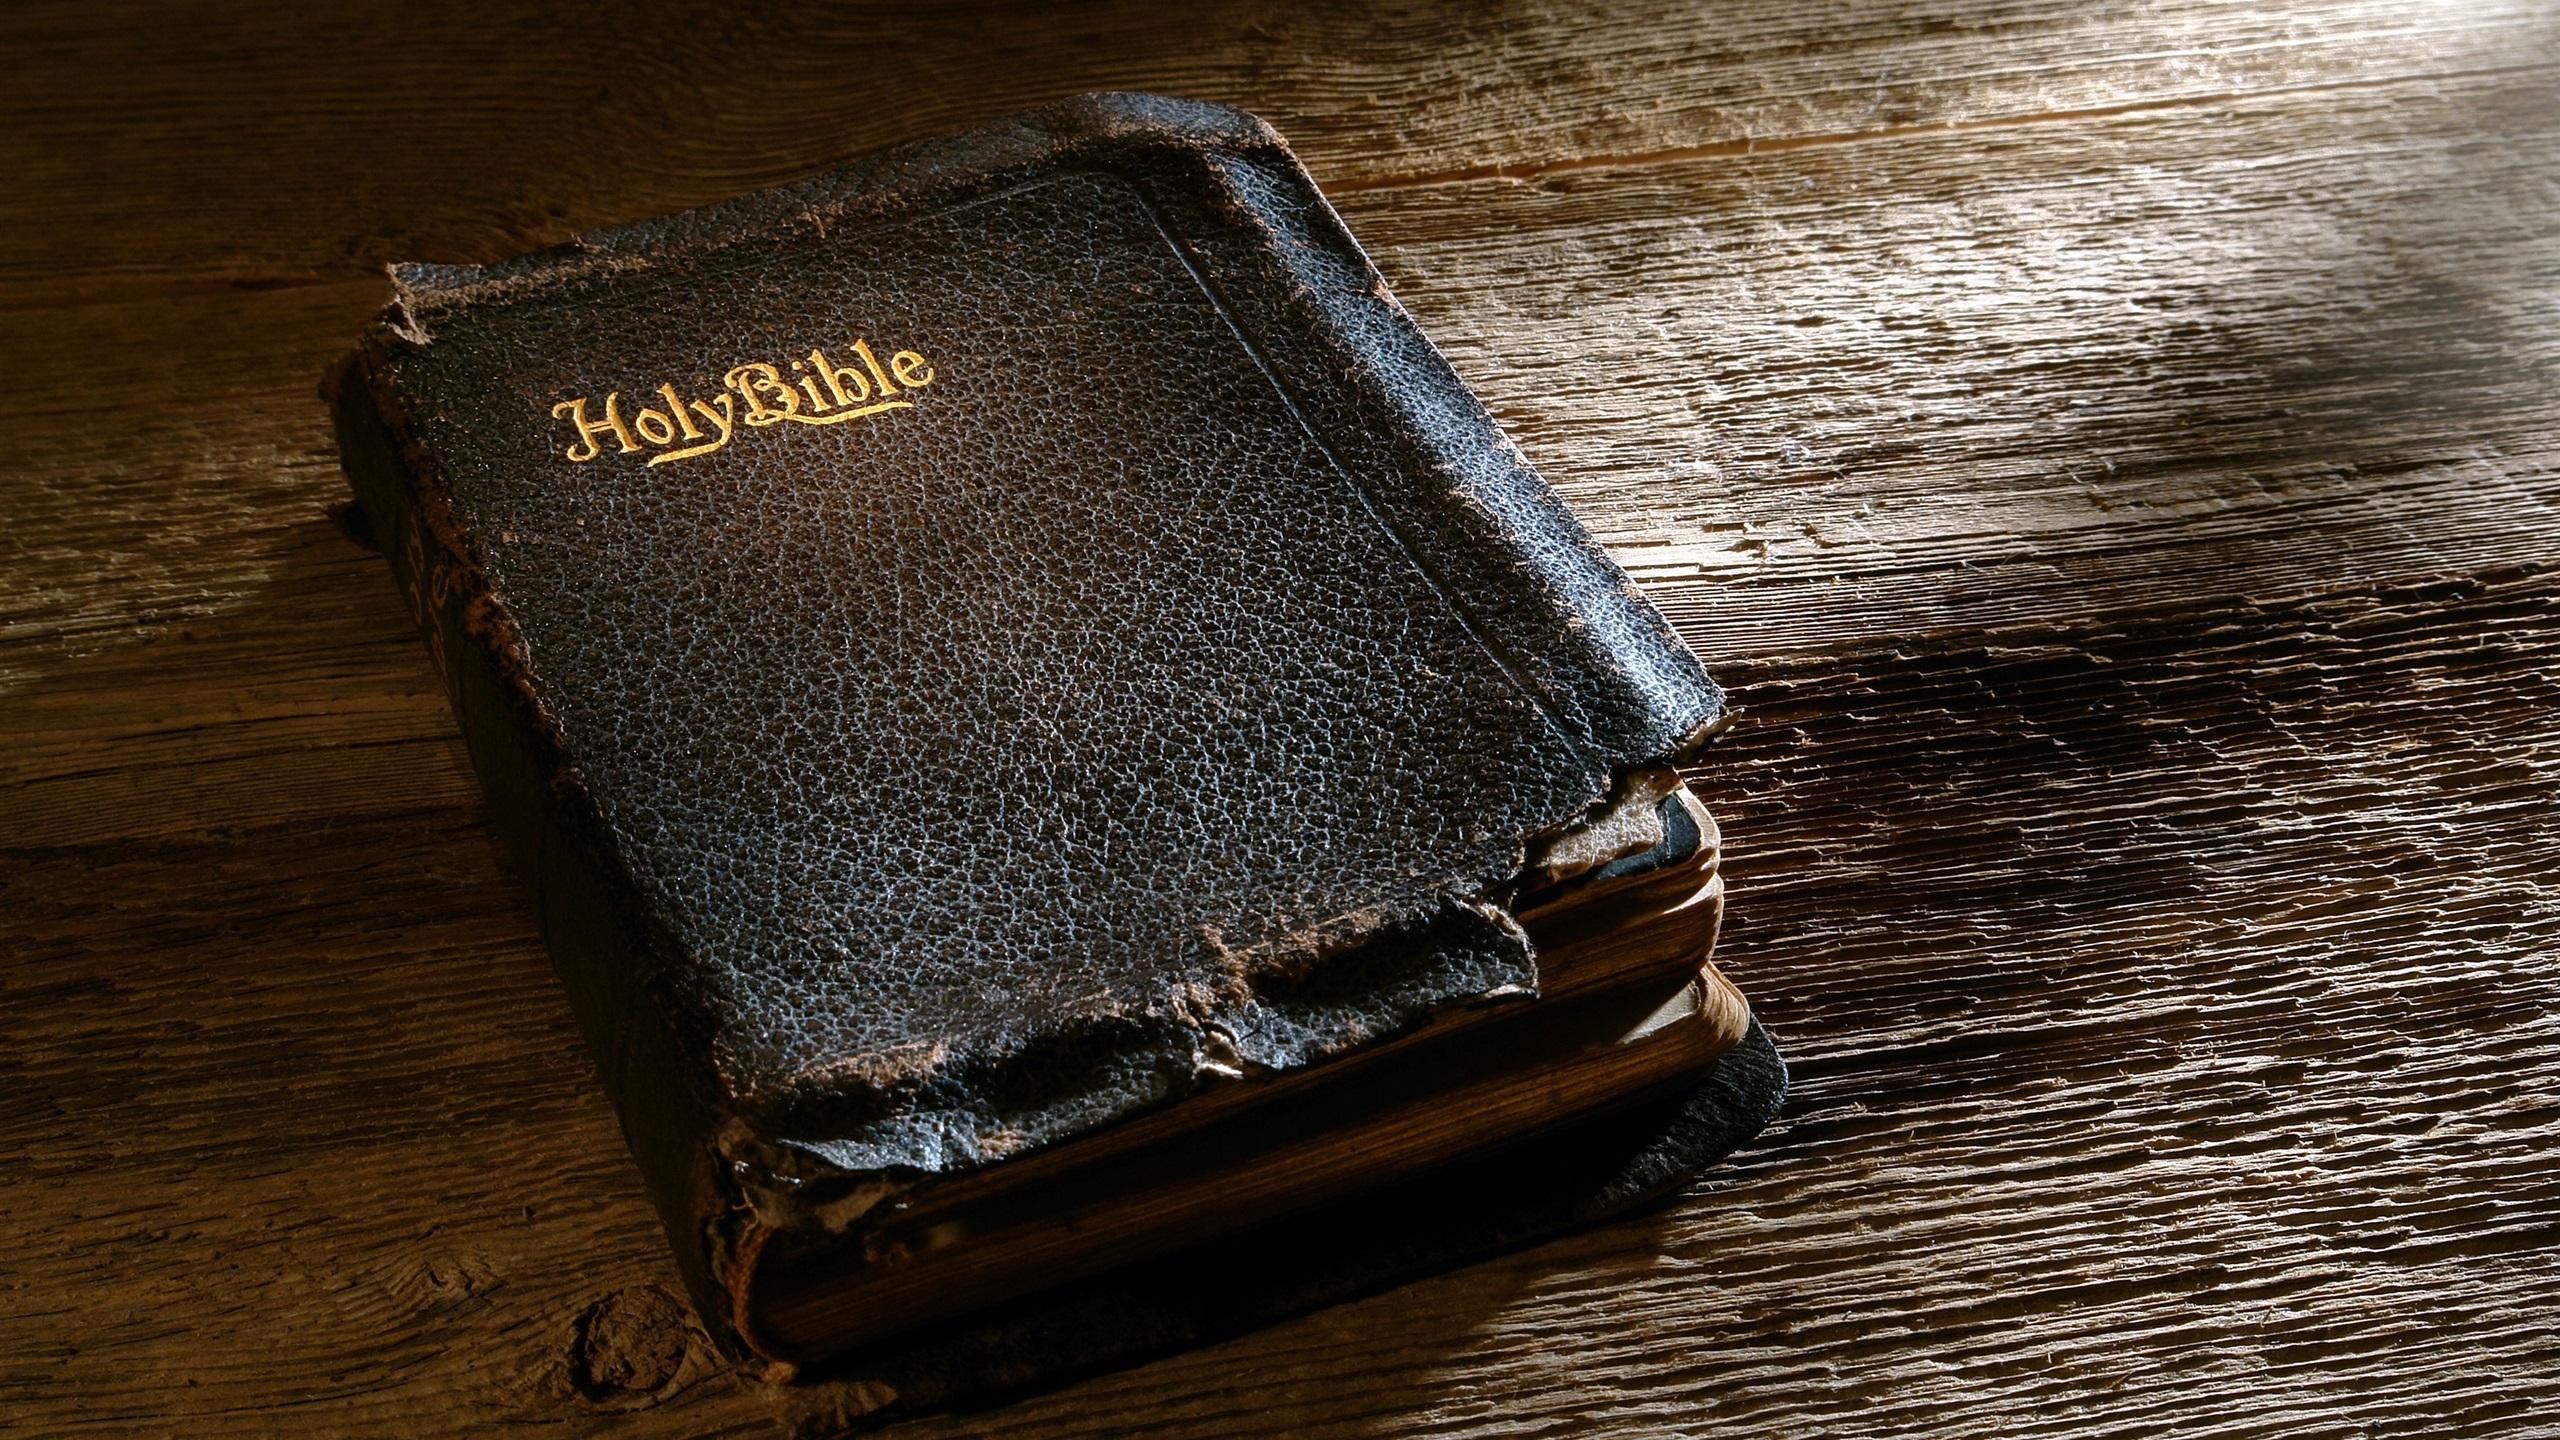 3840x2160 uhd 4k - Full hd bible wallpapers ...